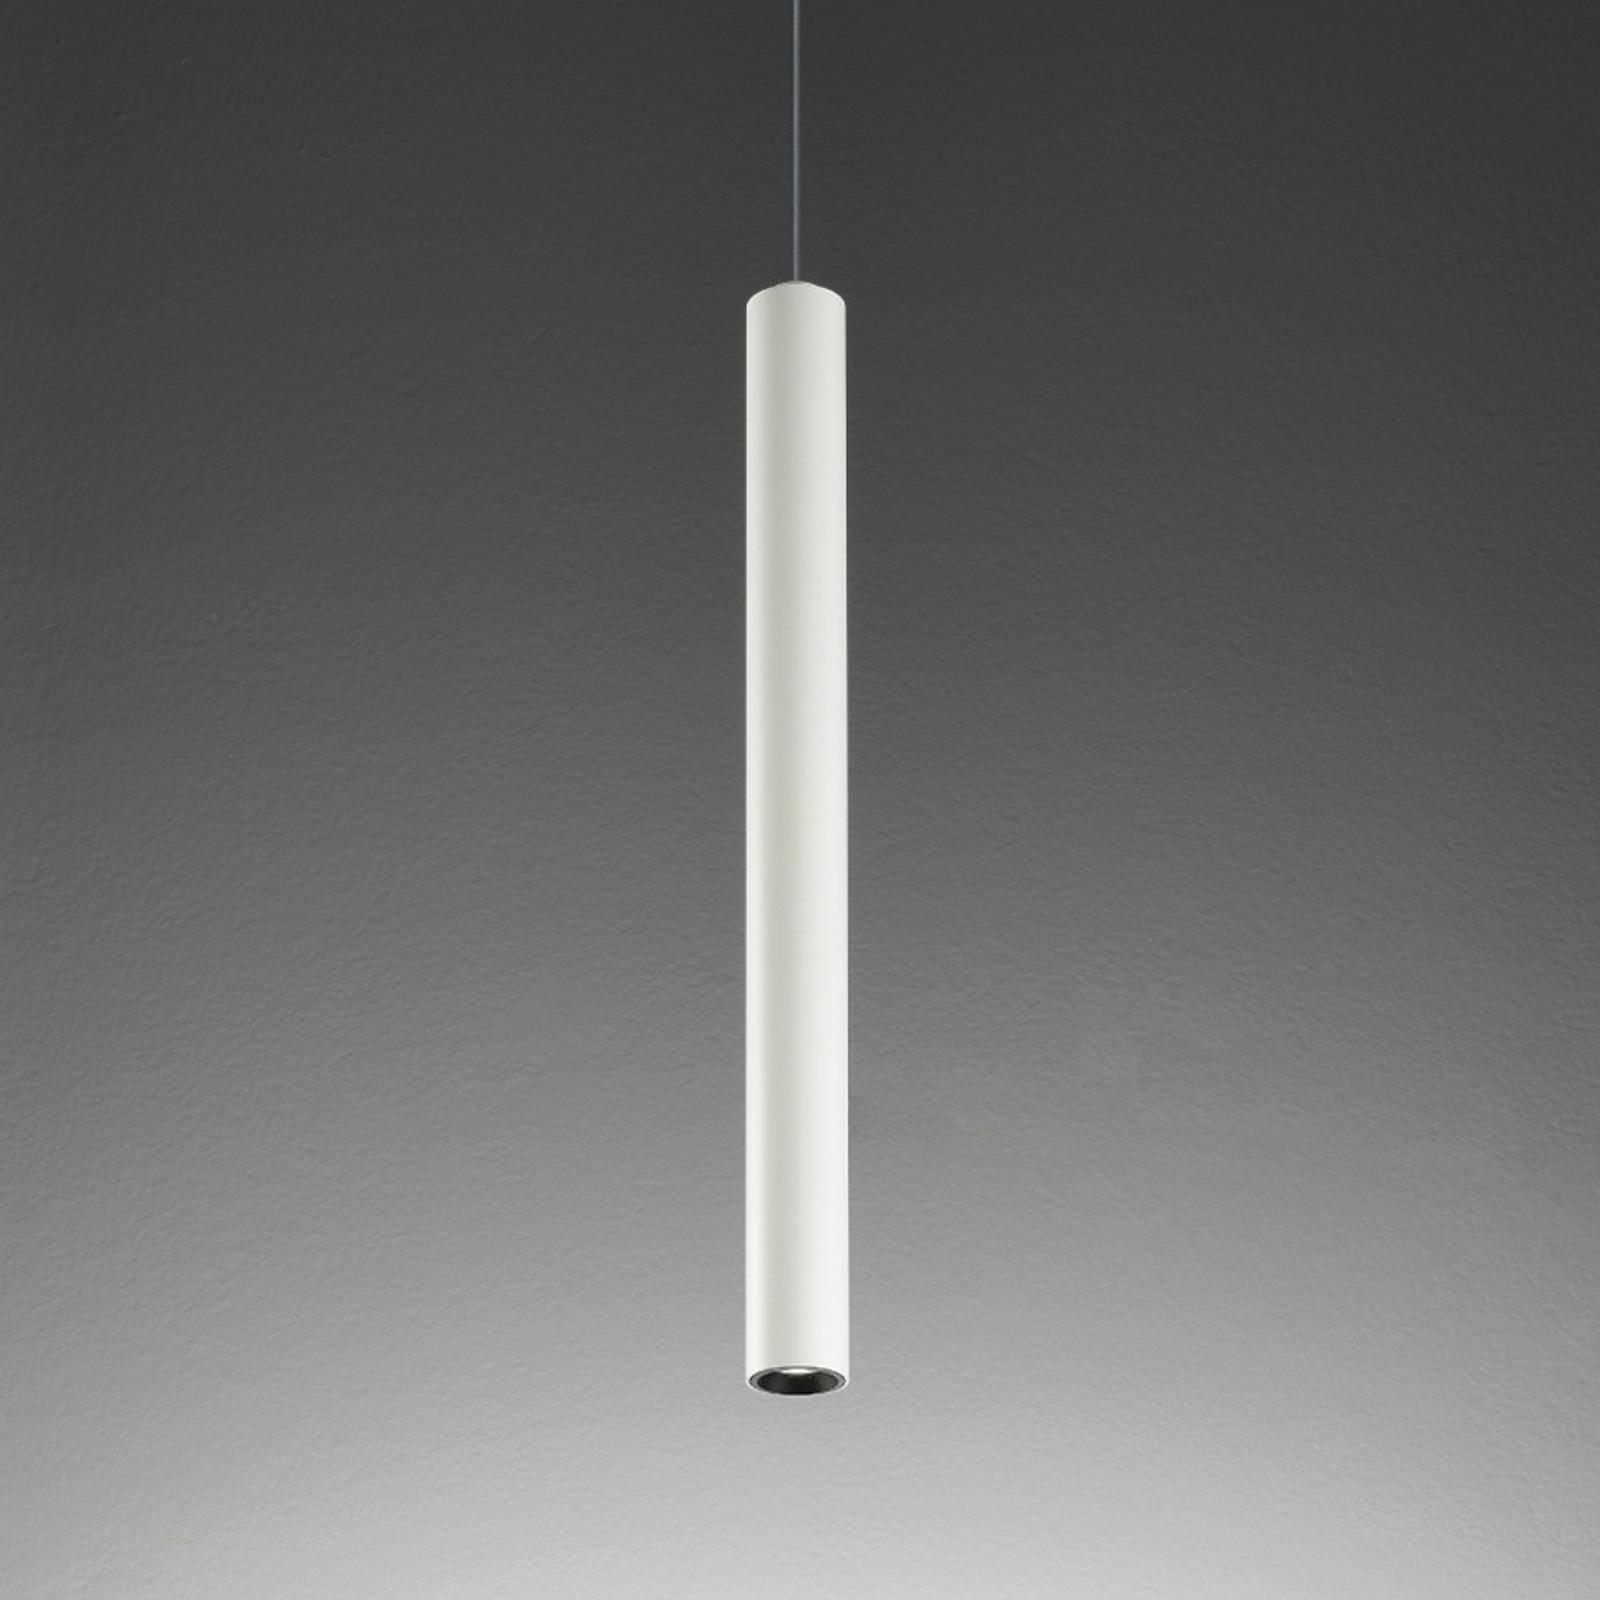 Effektiv LED-hengelampe Lilli